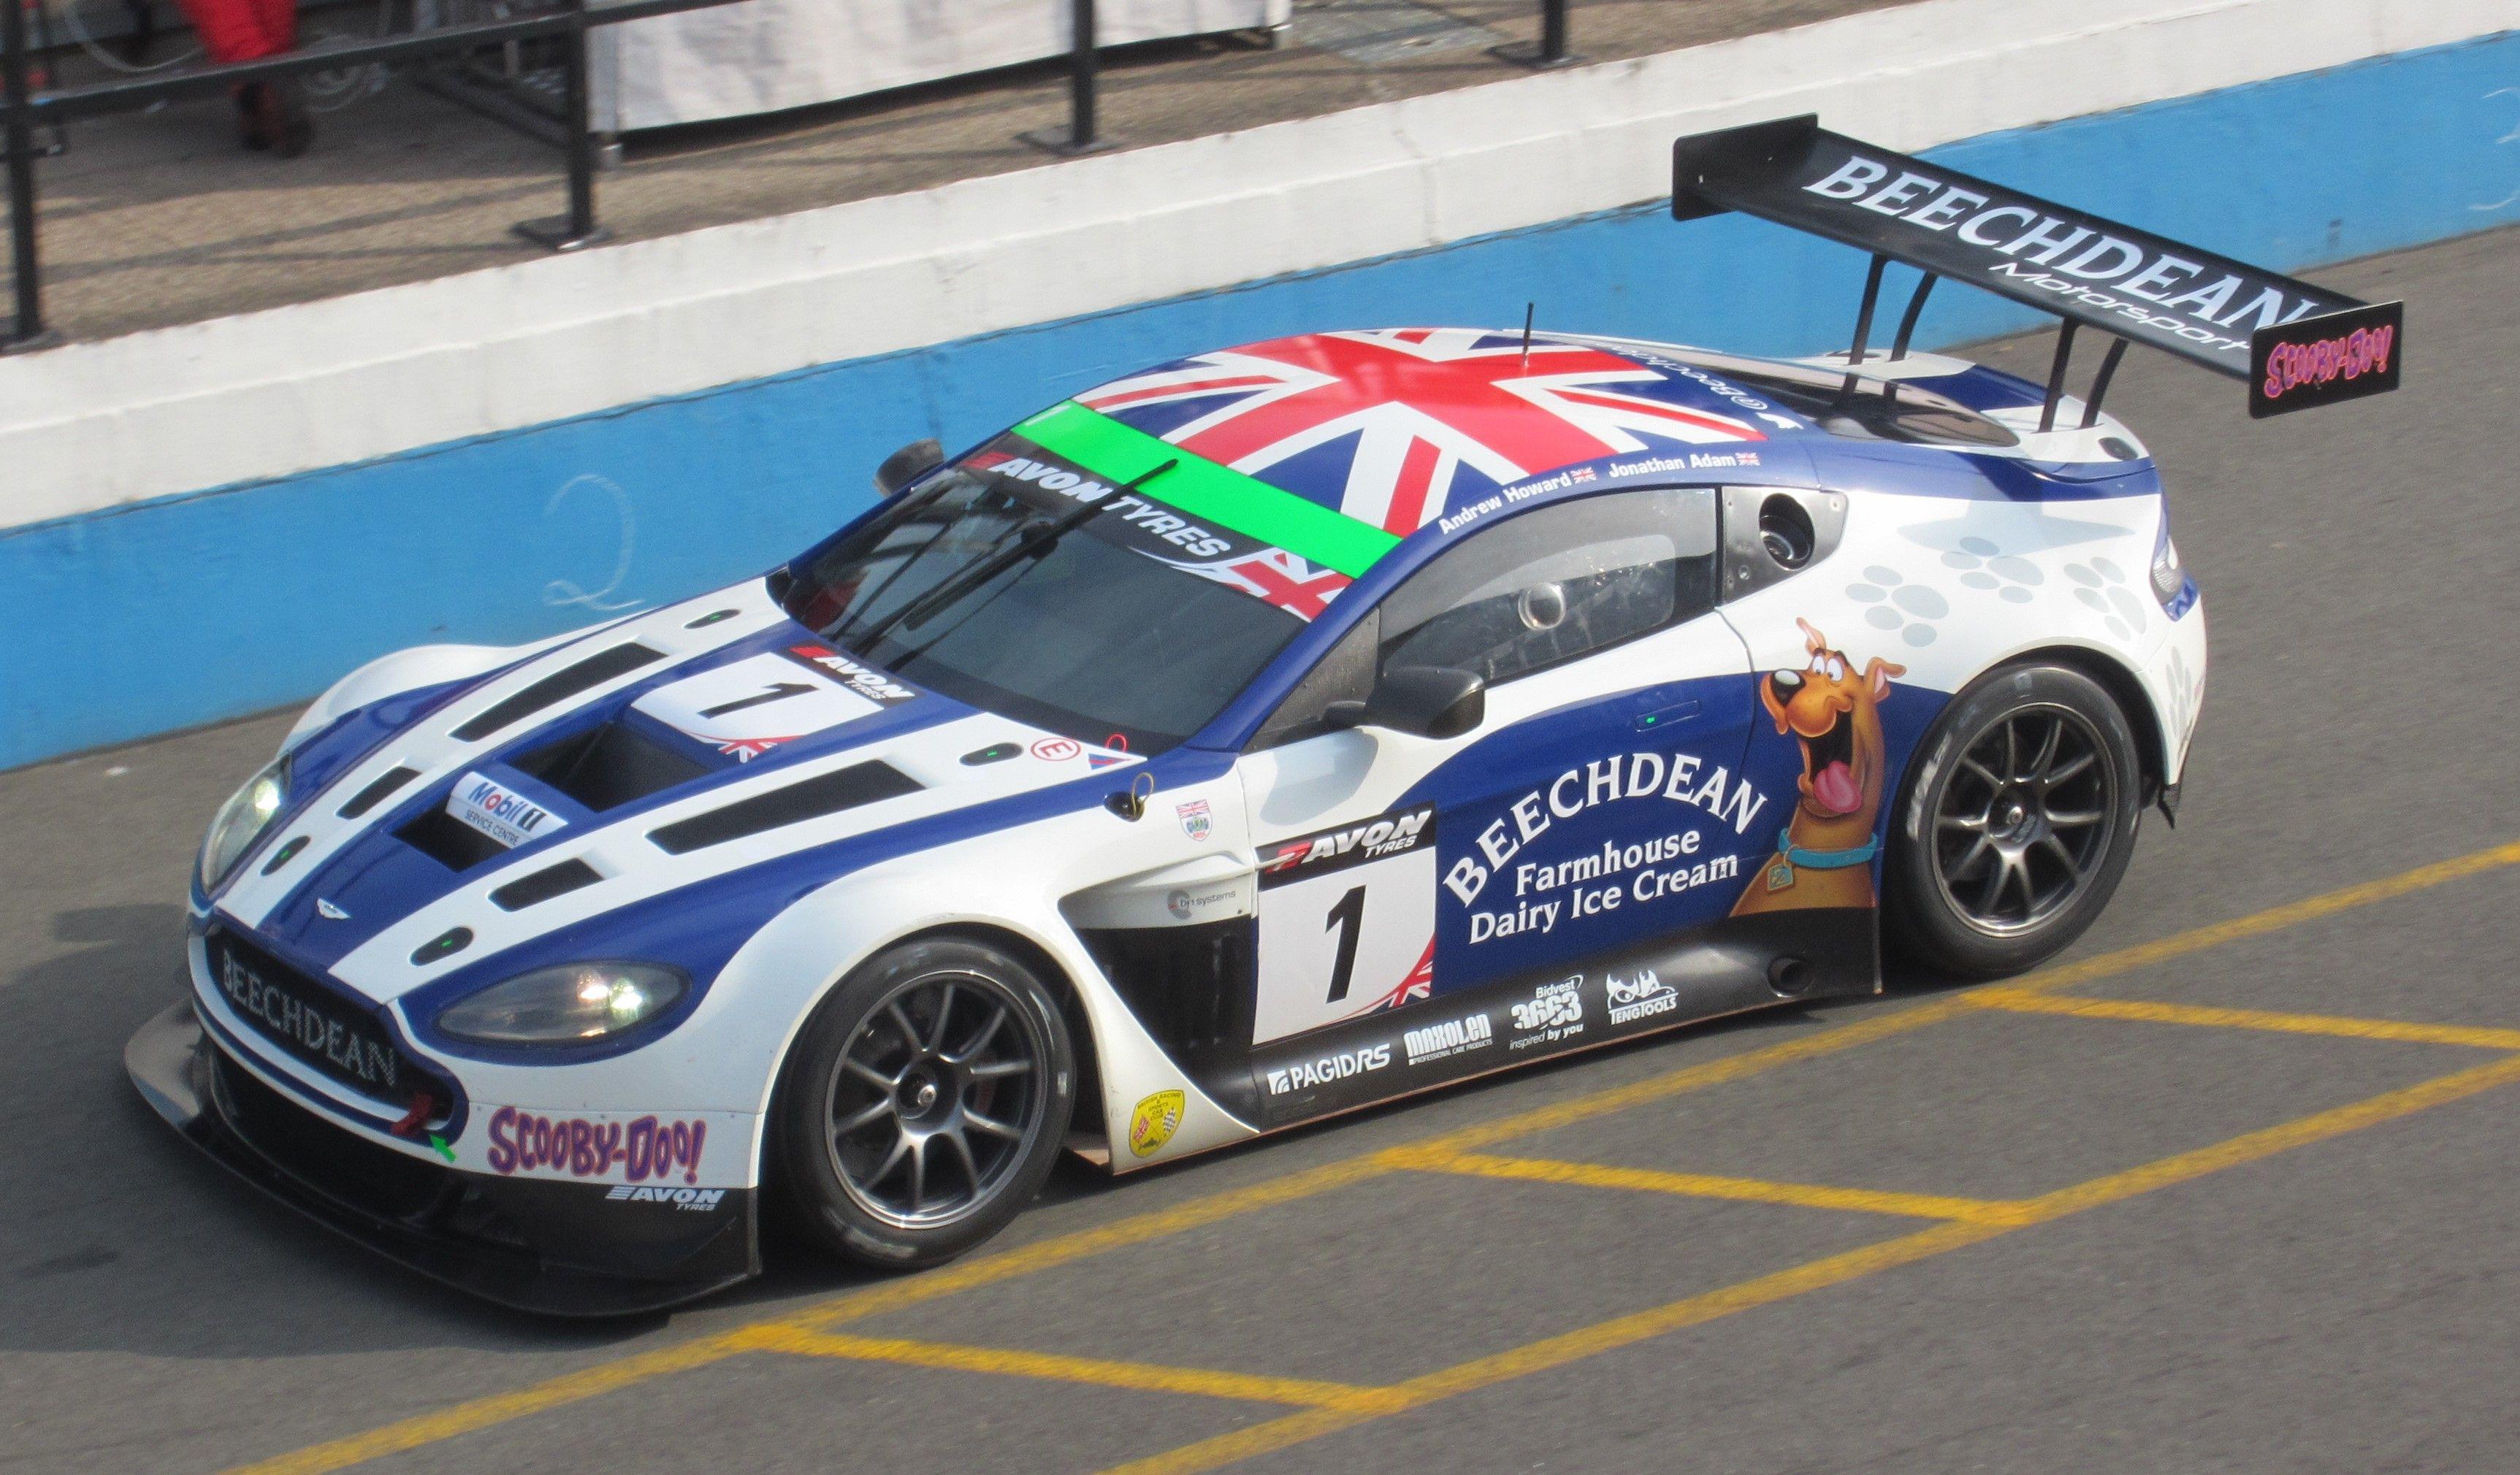 Aston Martin Vantage GT3 marcketing cars Pinterest